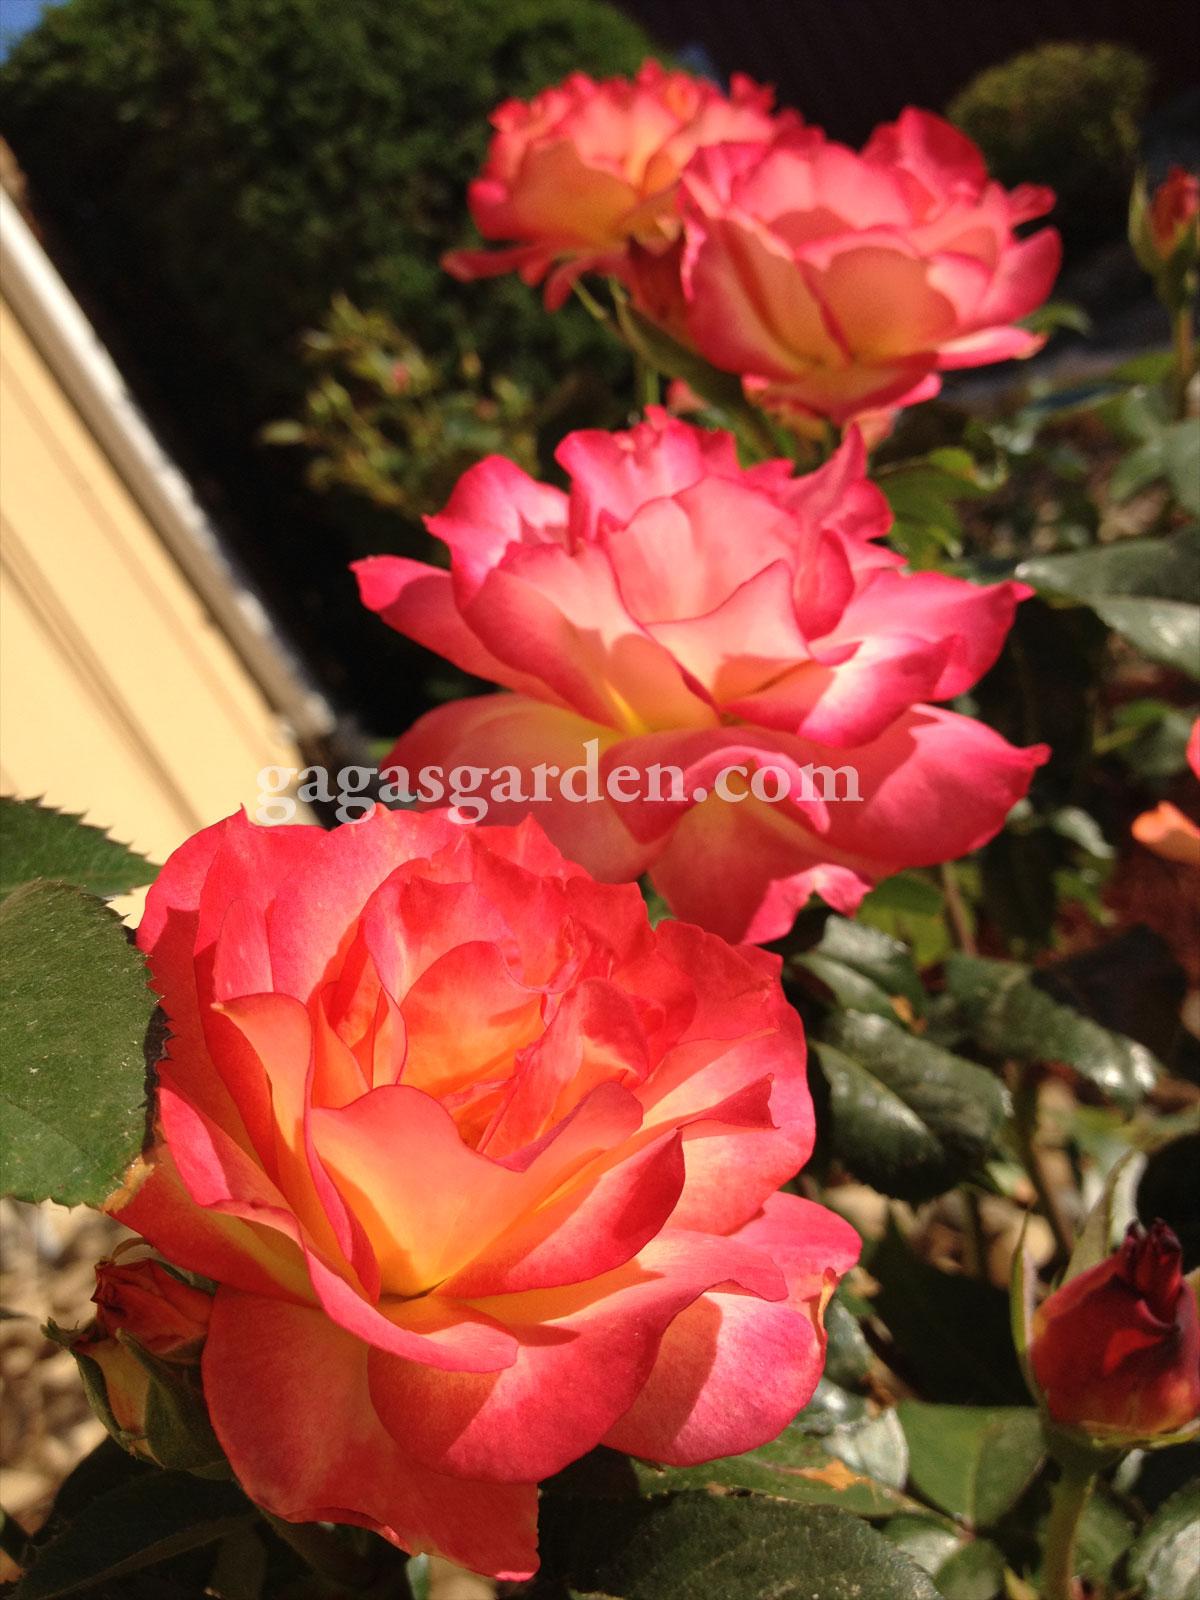 Roses, Rain and Rainbows – Gaga's Garden